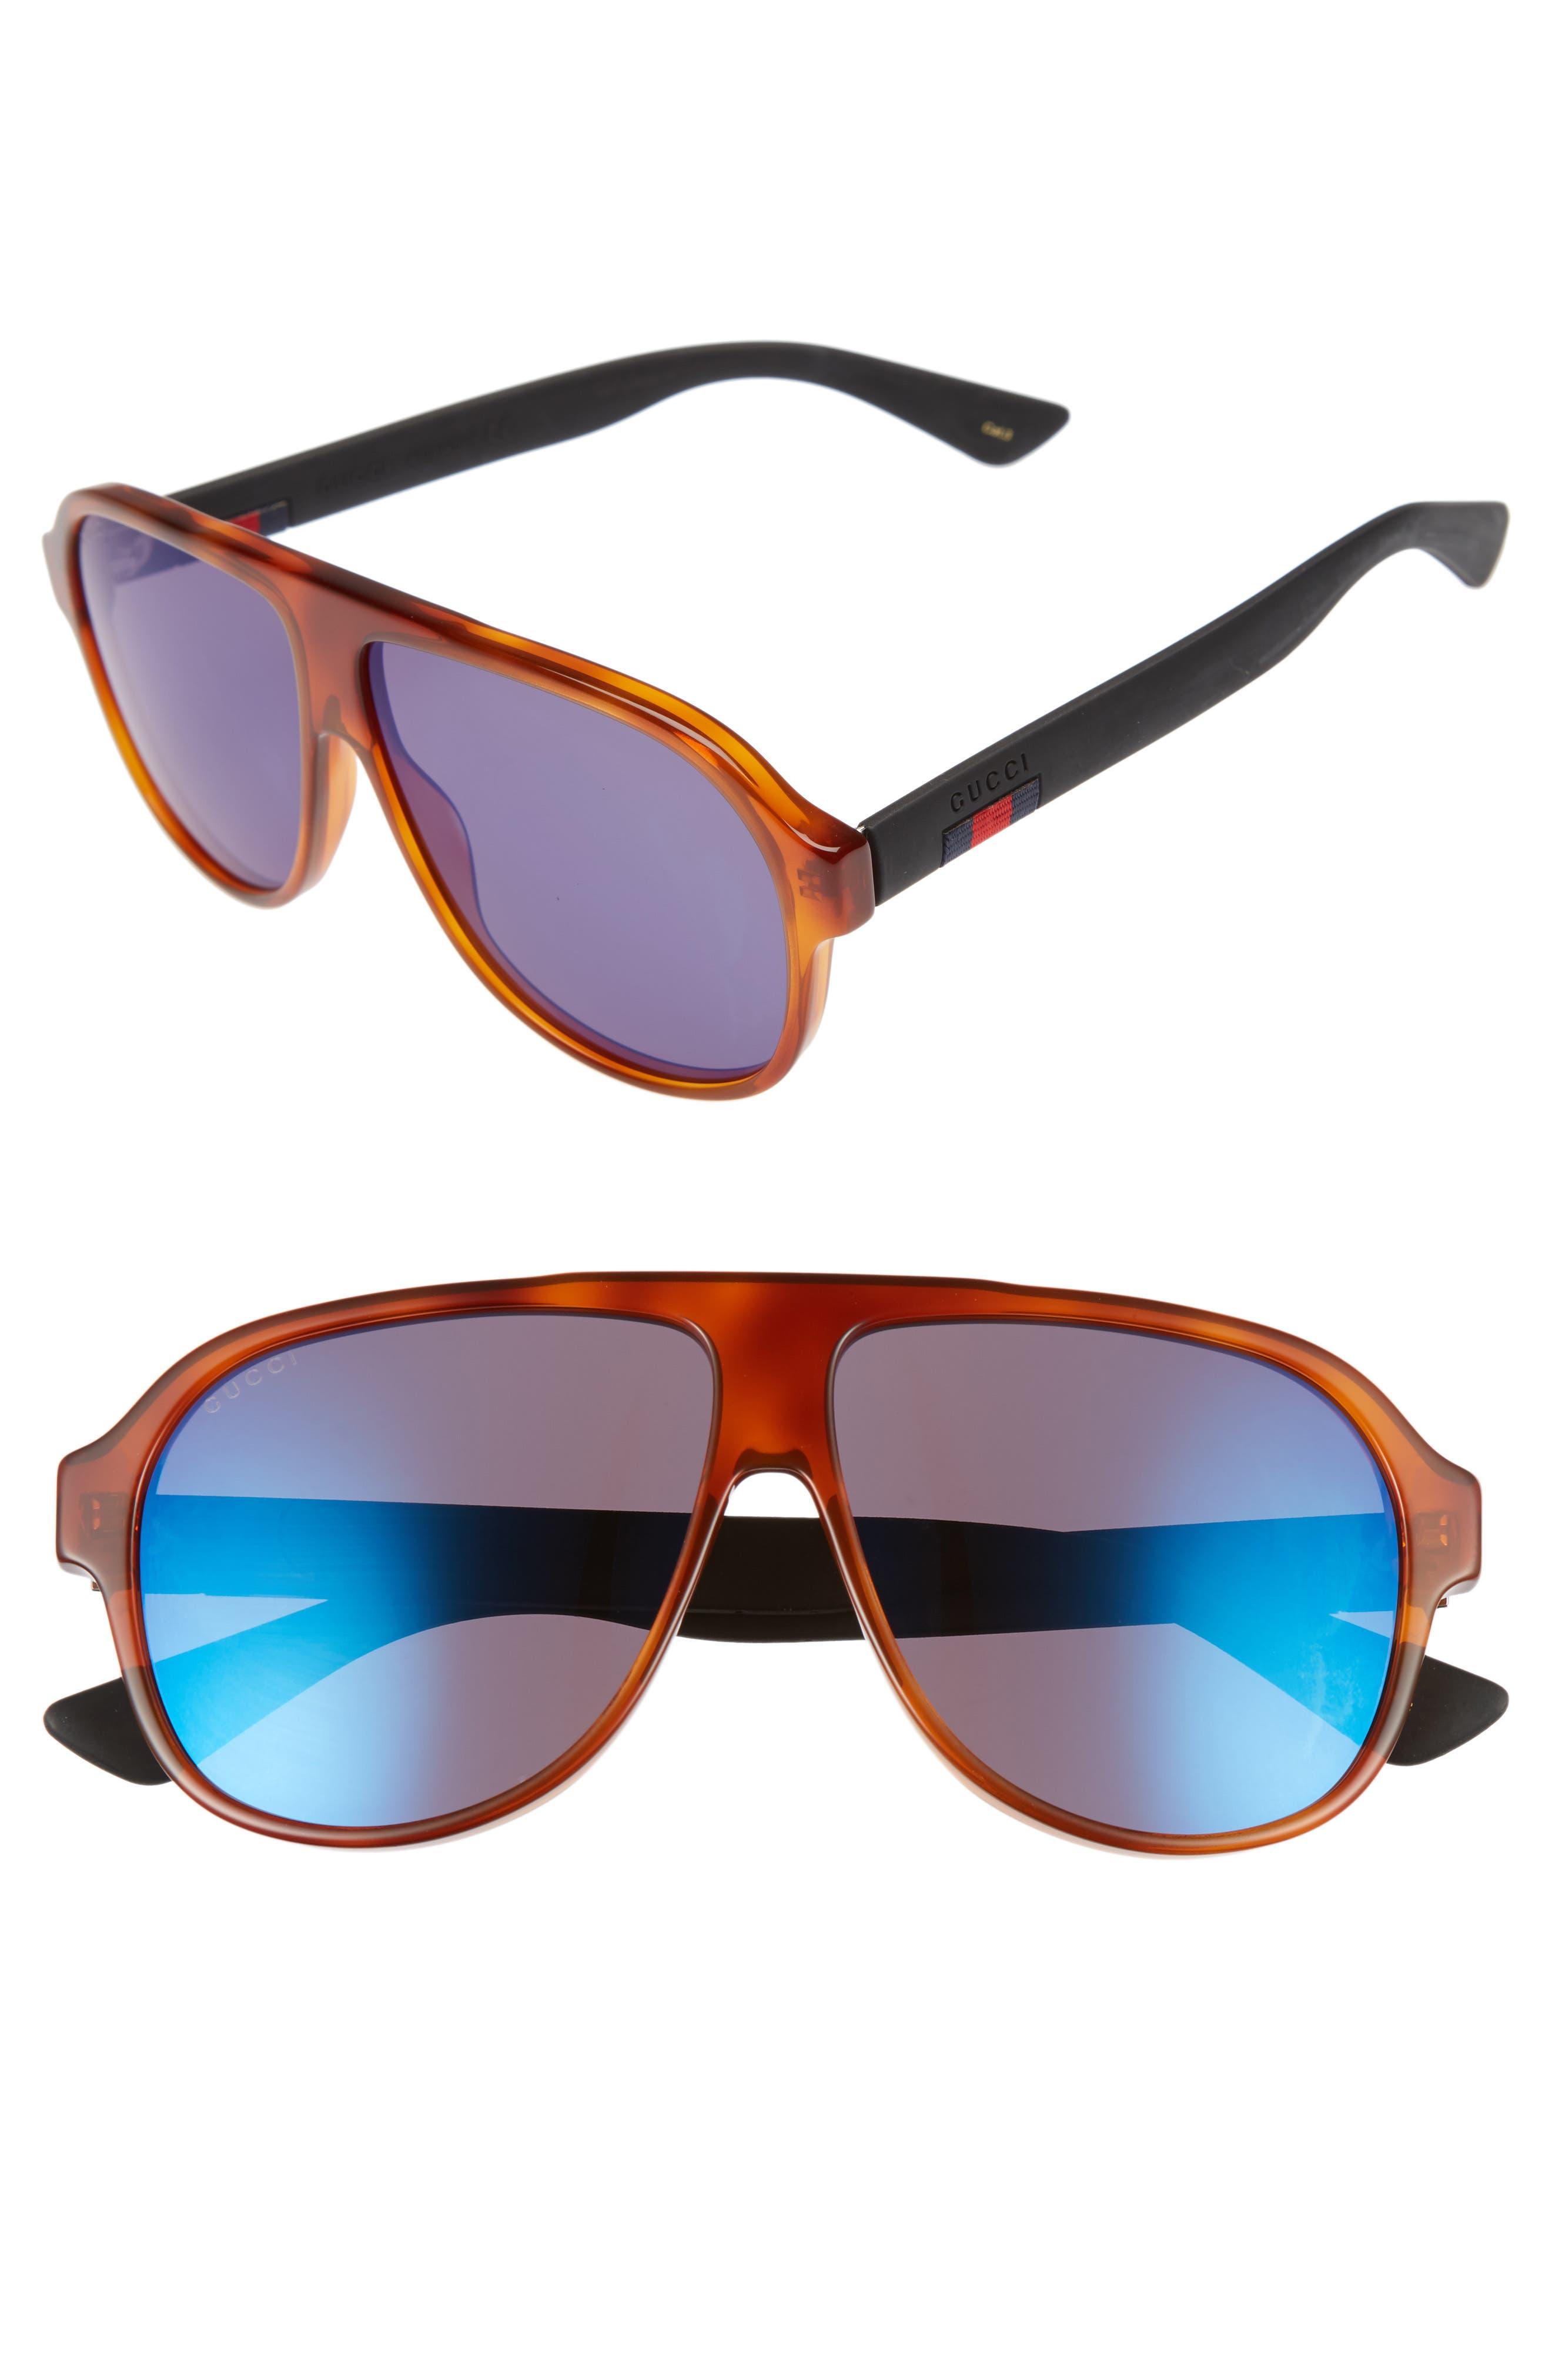 Main Image - Gucci Oversize 59mm Sunglasses